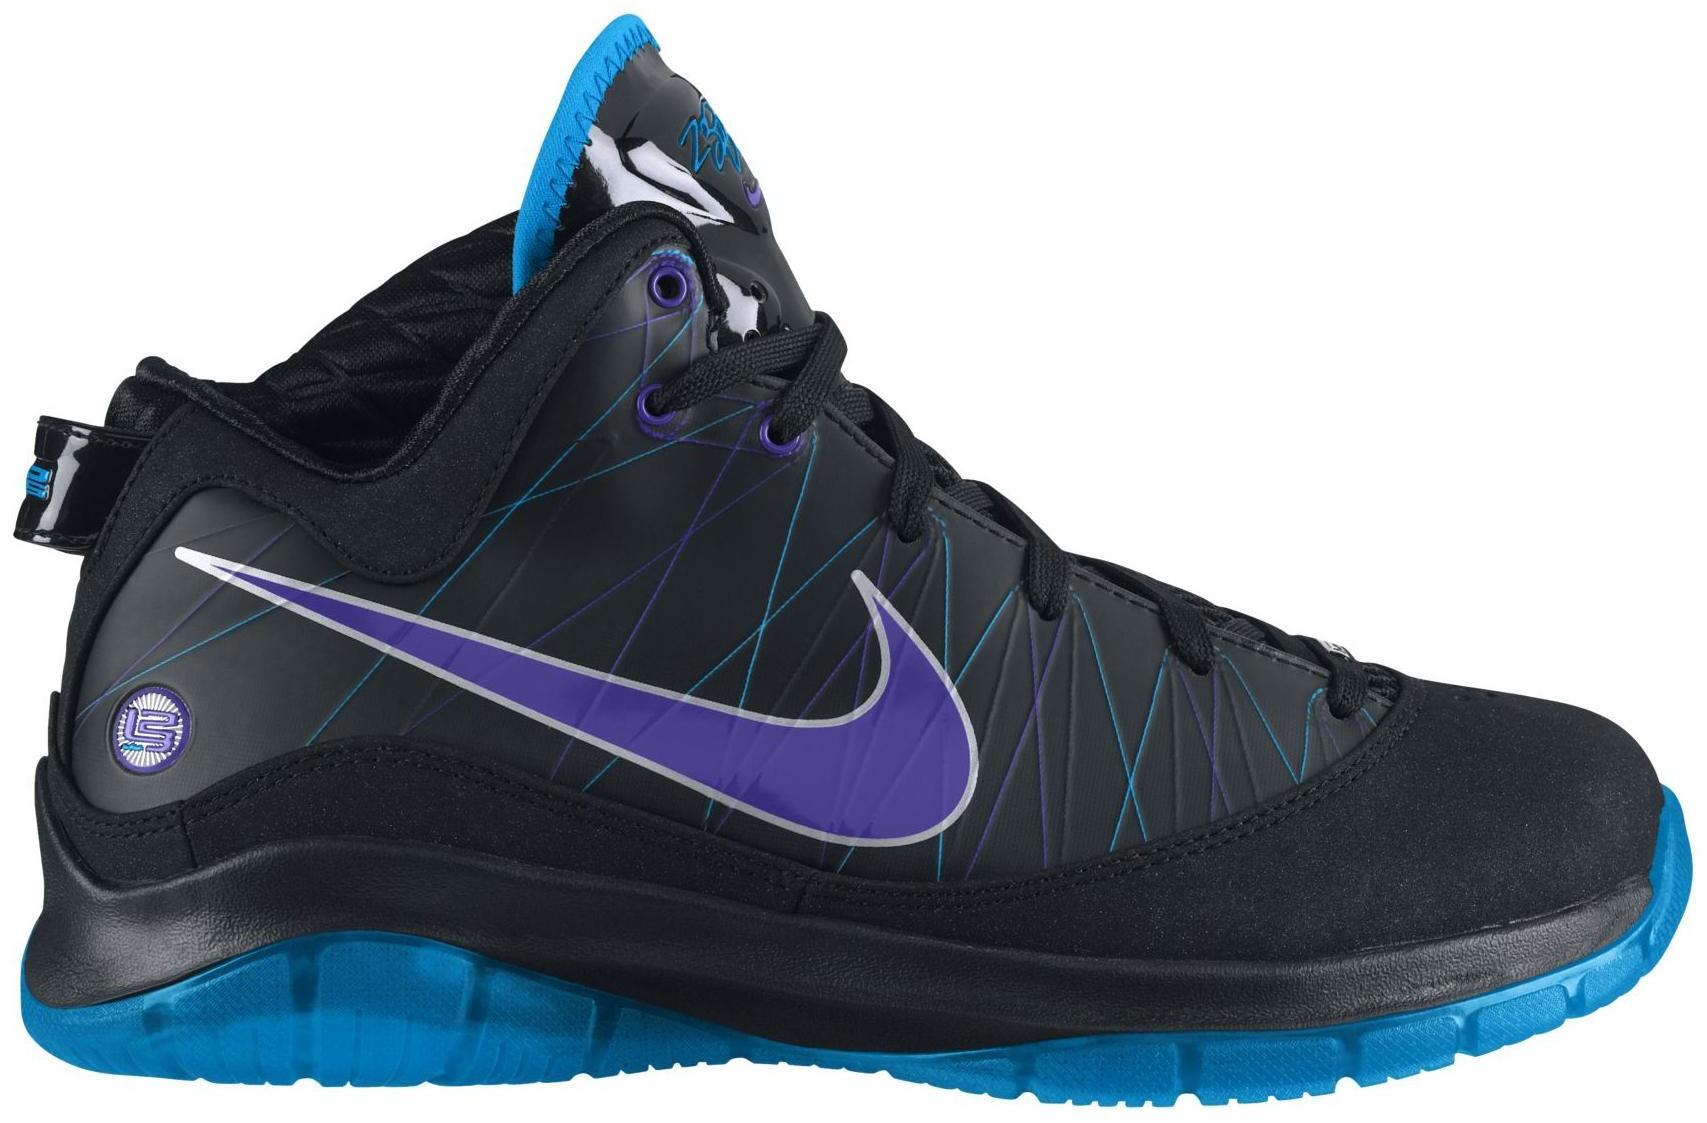 Nike LeBron 7 PS P.S. Summit Lake